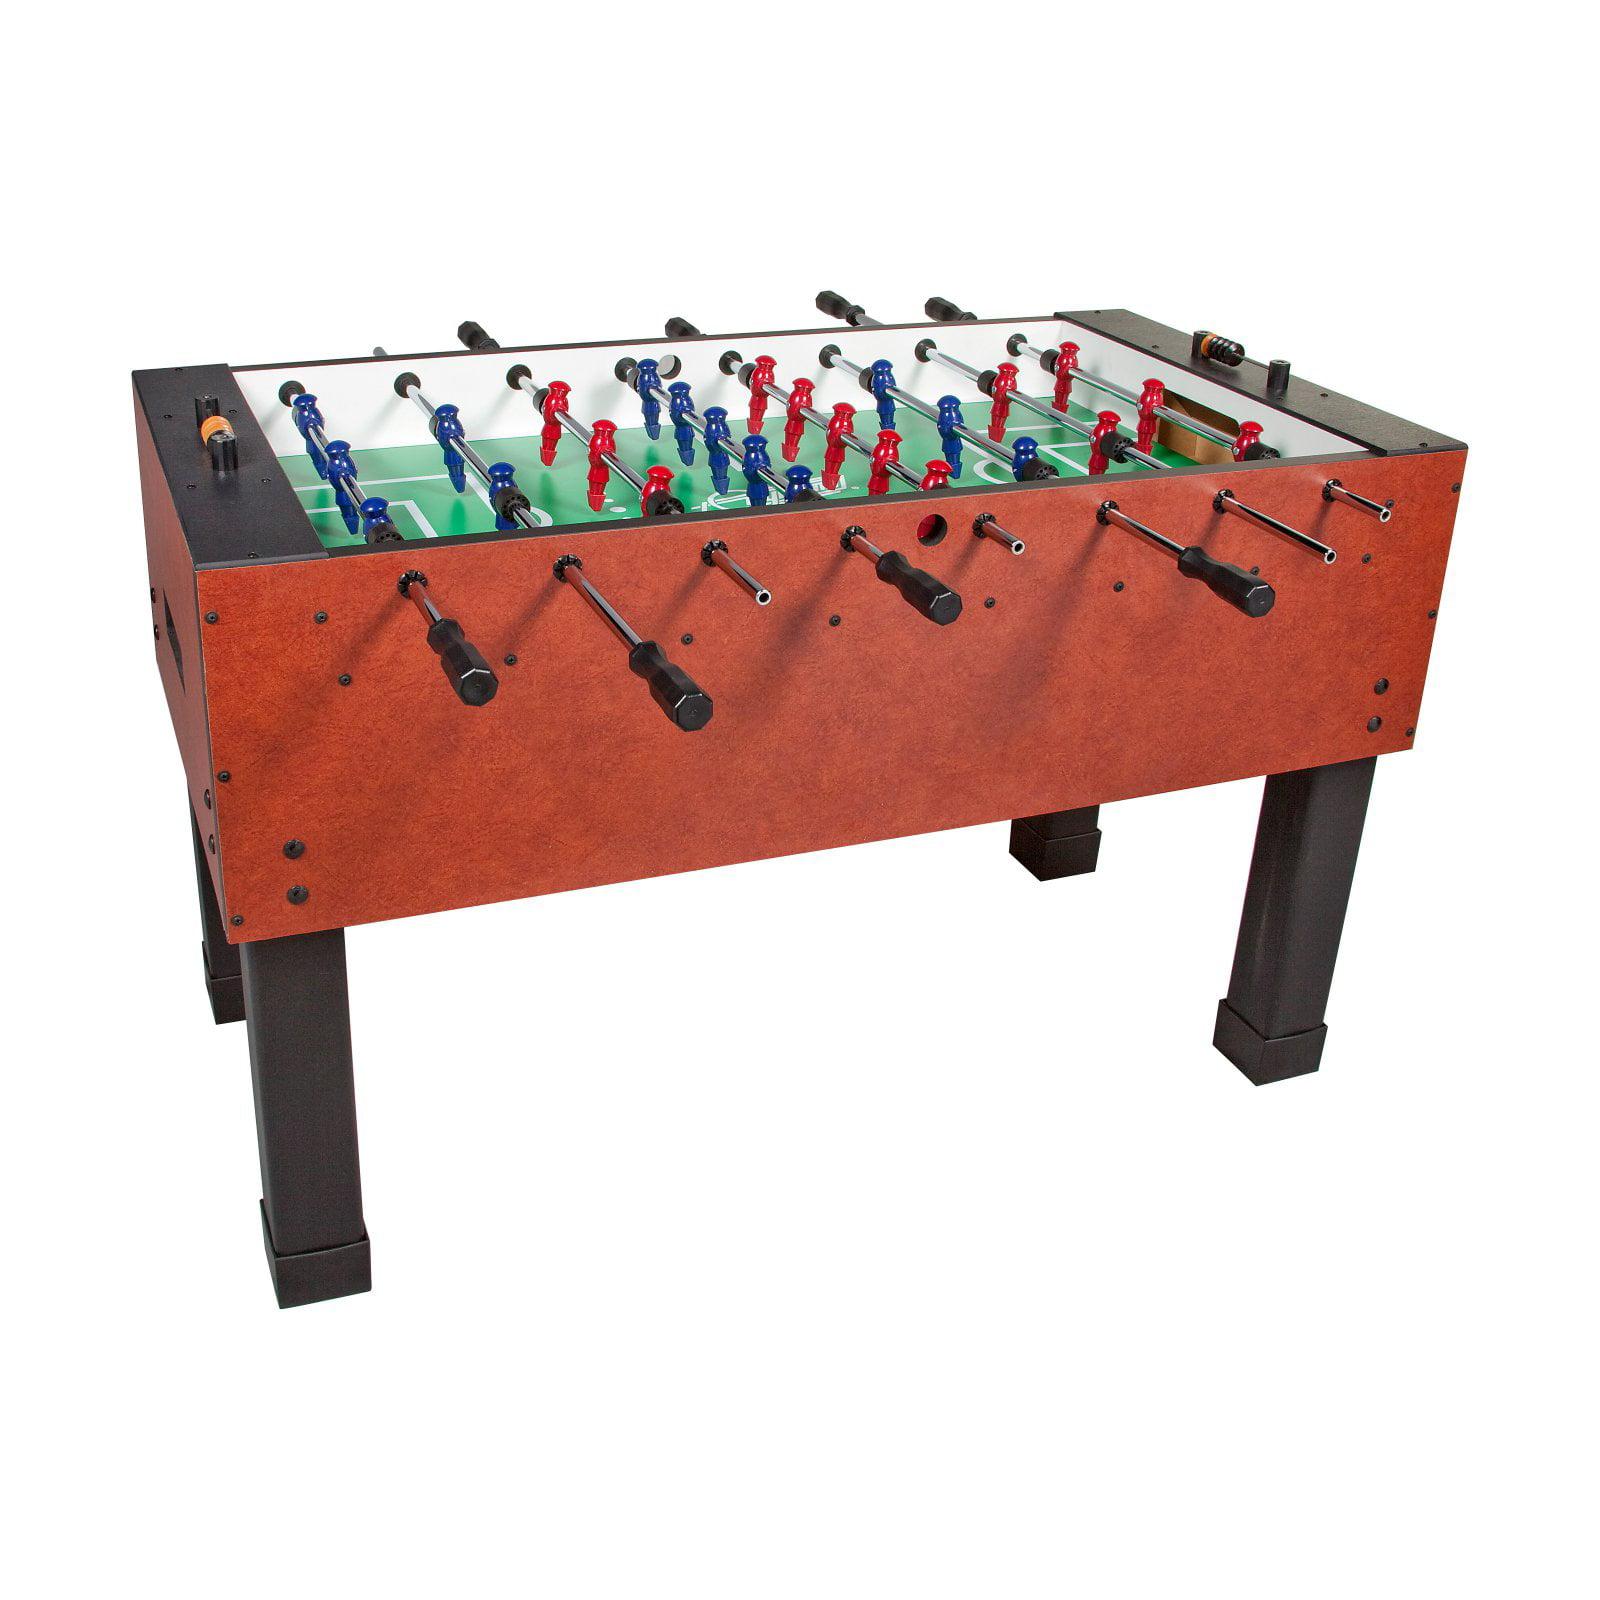 Dynamo Blaster Foosball Table by Central Distributing Inc